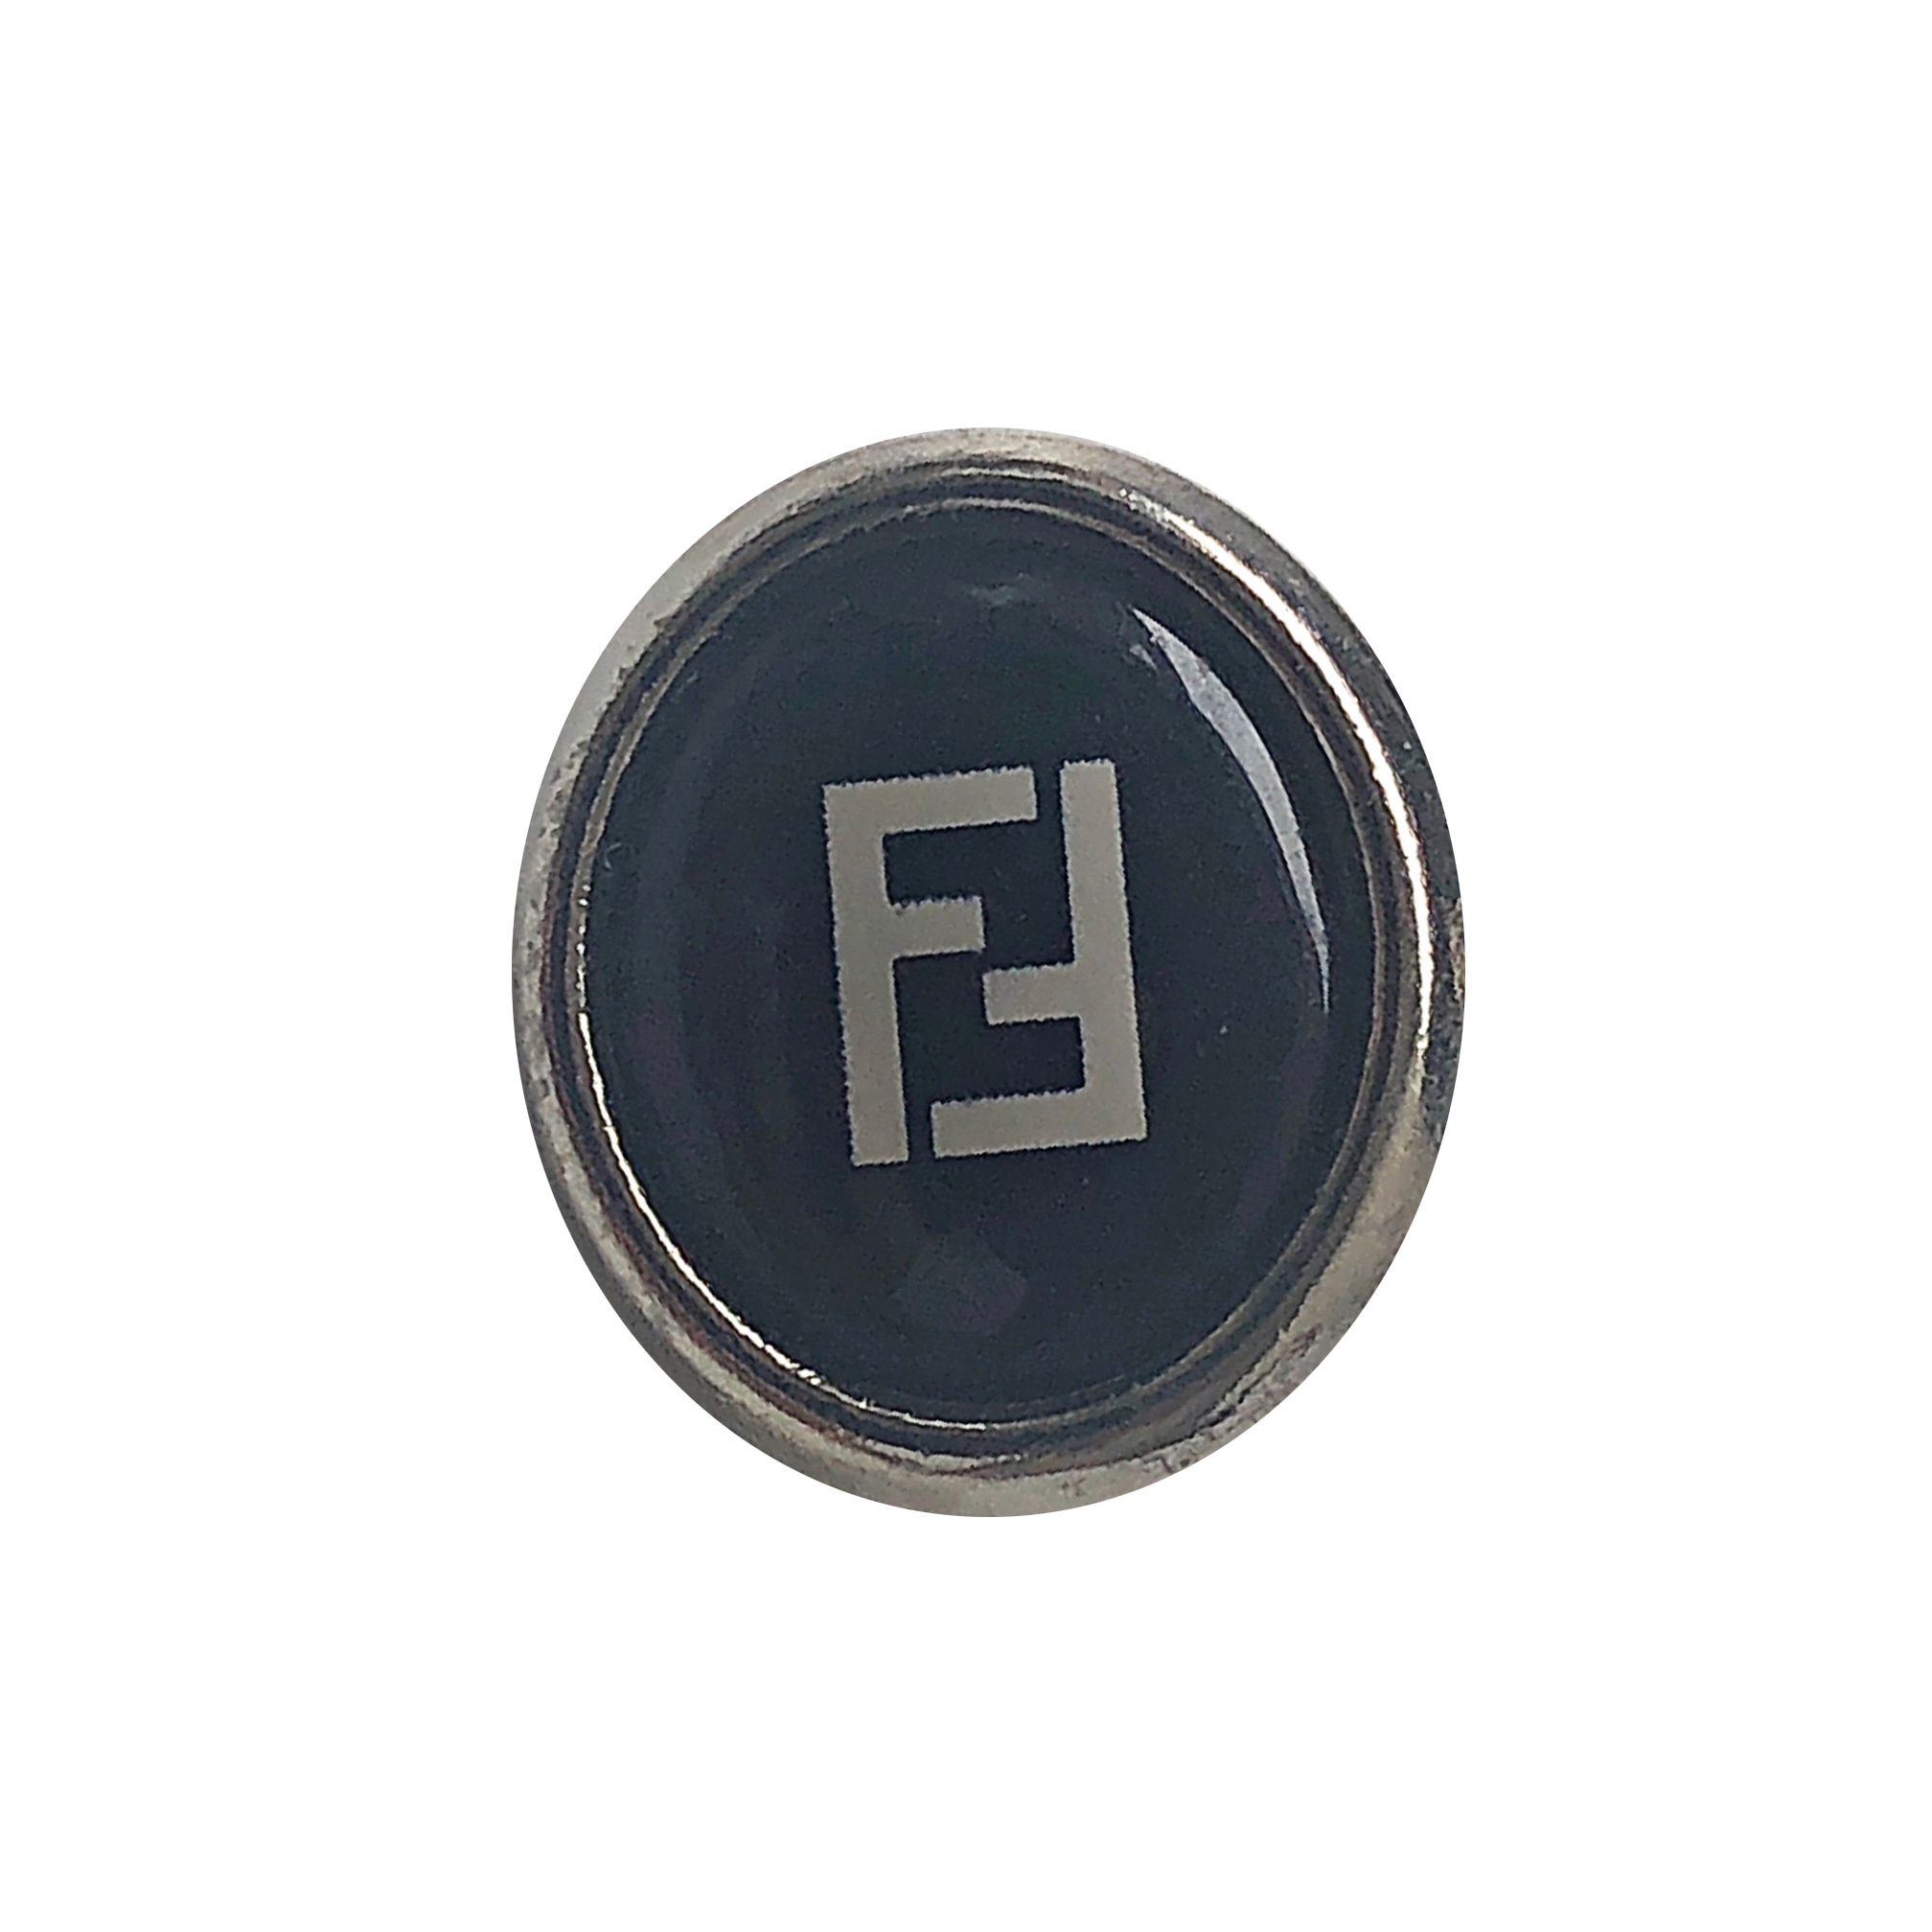 【VINTAGE FENDI BUTTON】Ellipse ブラック ボタン